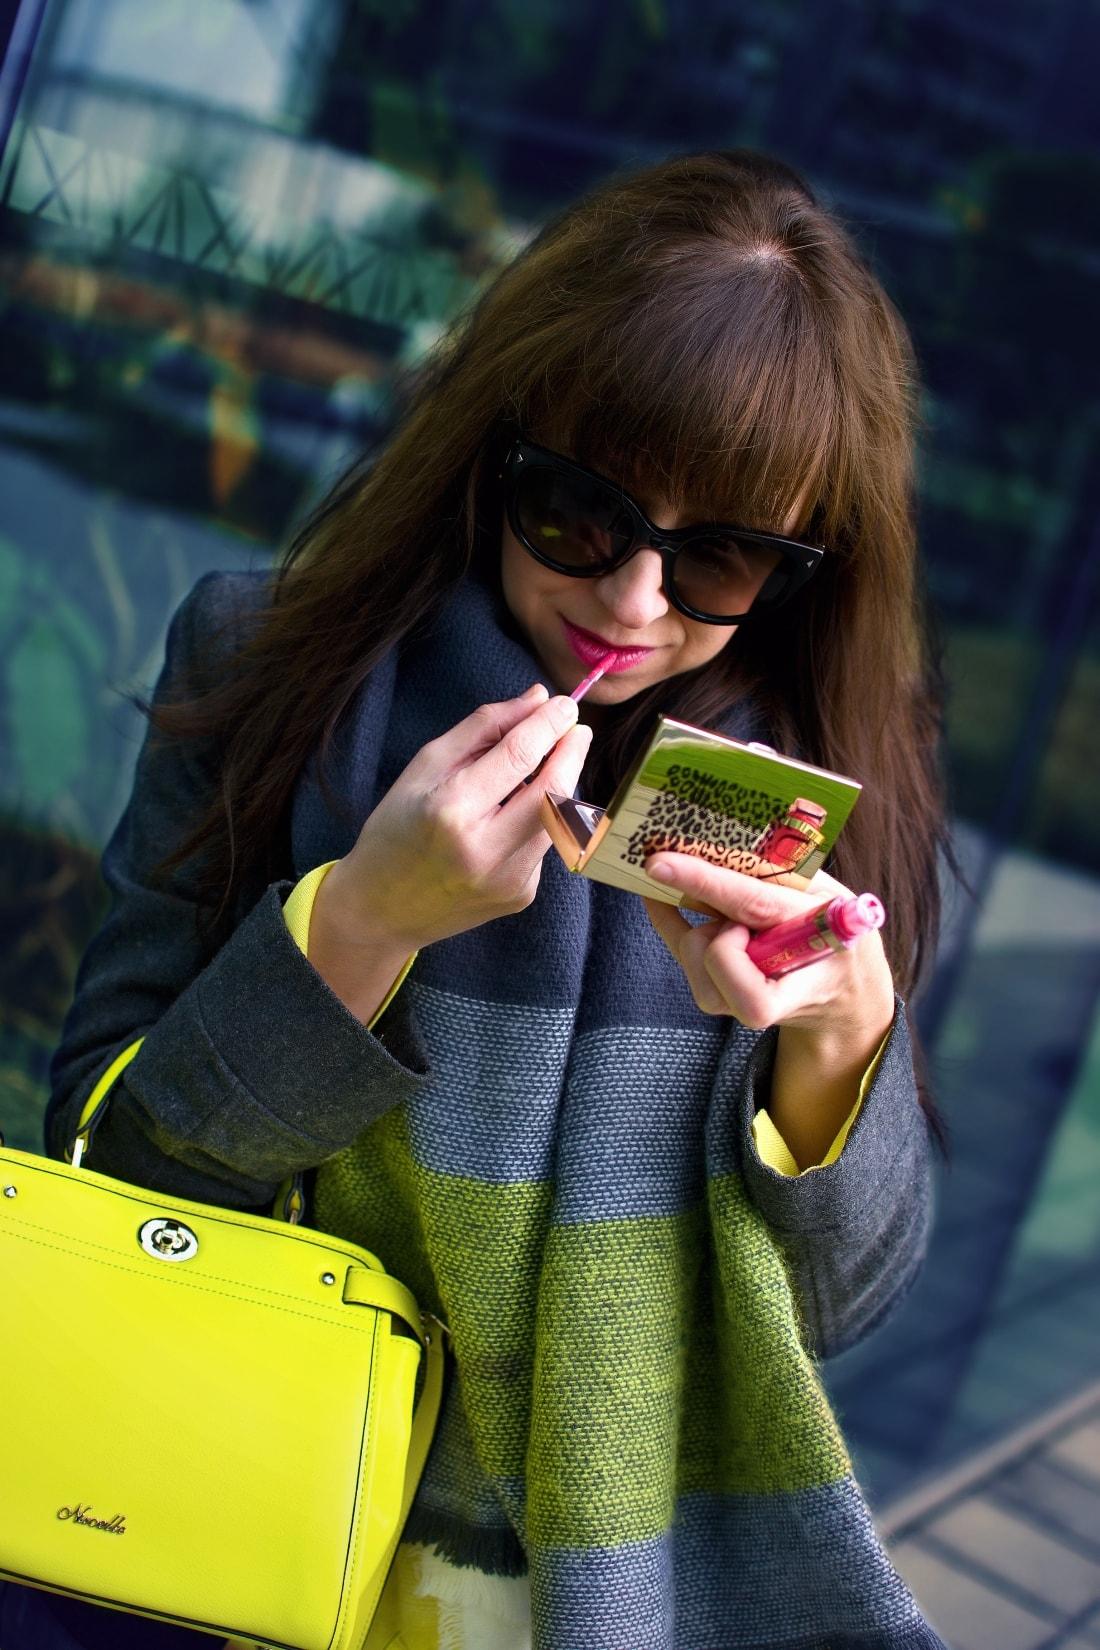 I LOVE COLOURED TIGHTS_Katharine-fashion is beautiful_blog 7_autumn look_Ripped jeans_Žltý sveter Zara_Žltá kabelka Nucelle_Čierne slipony Eobuv_Katarína Jakubčová_Fashion blogger